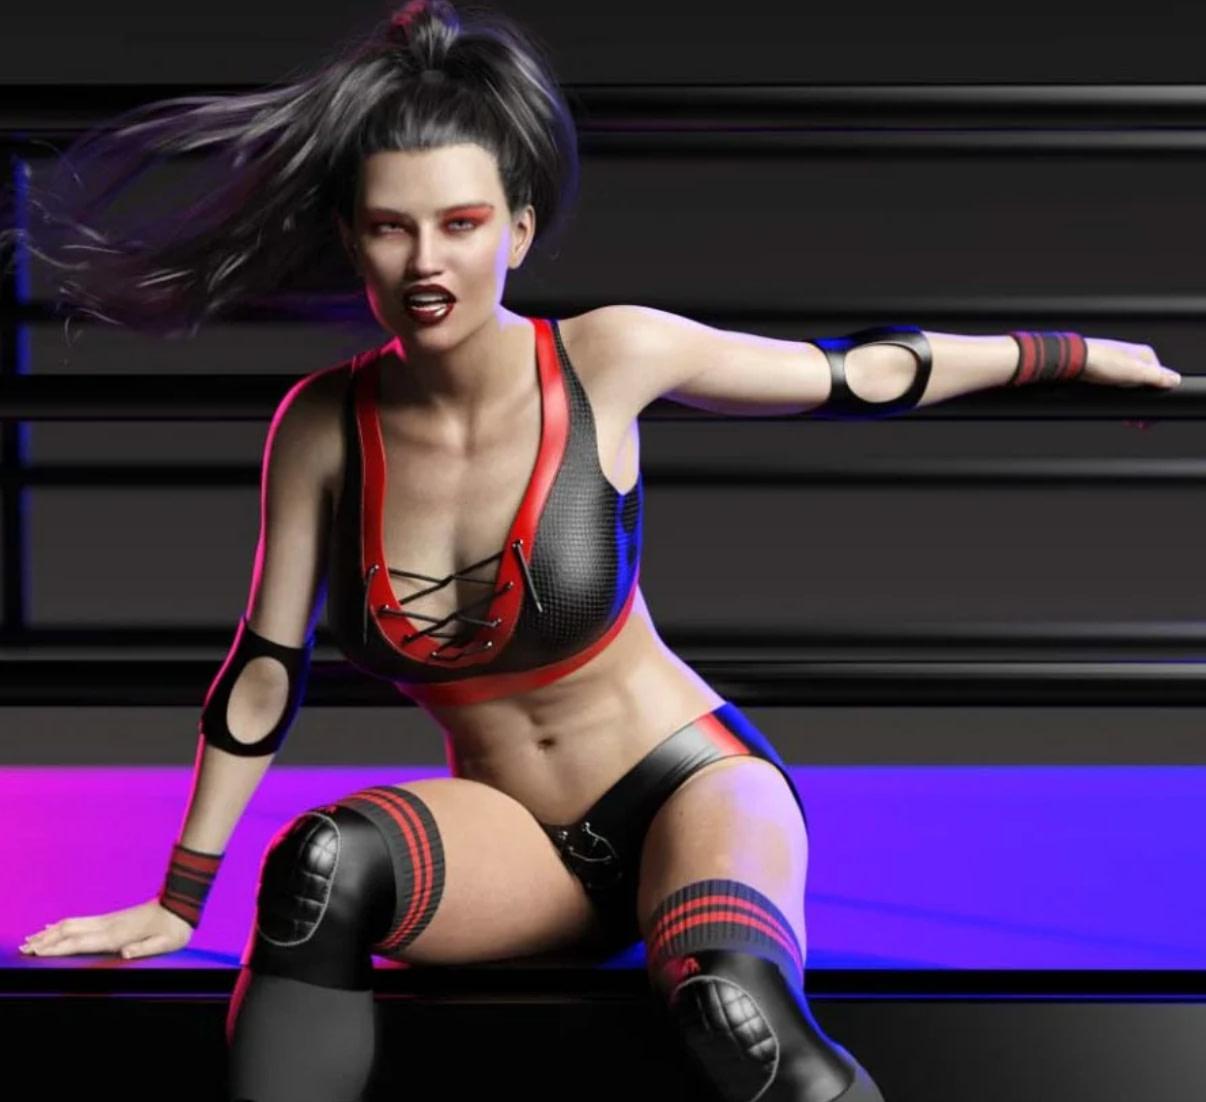 daz cb takedown wrestling clothes genesis 8 female